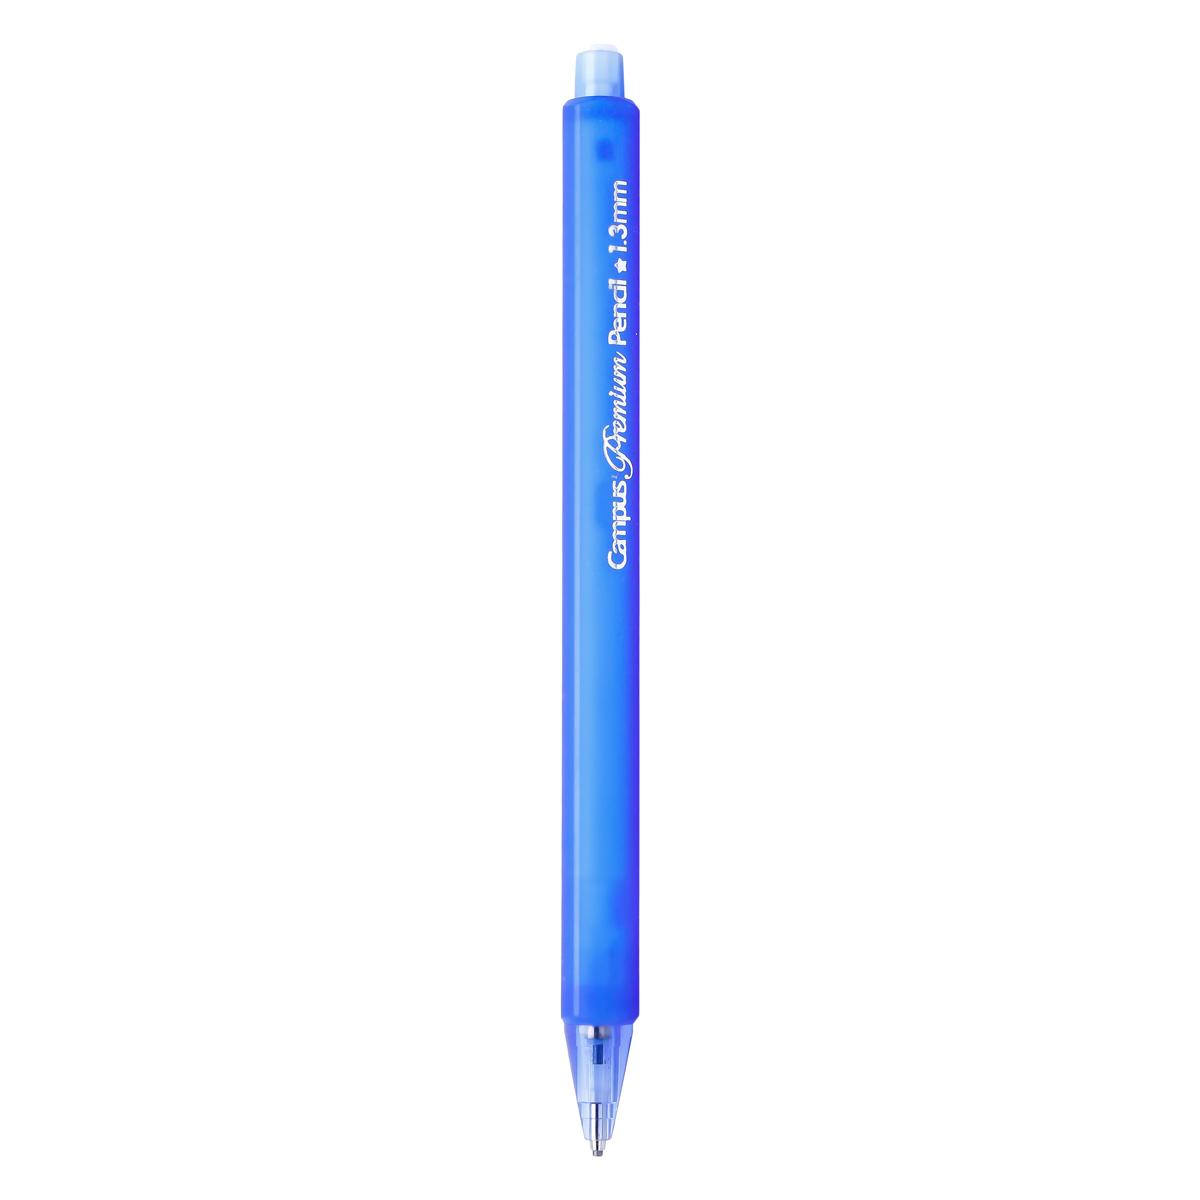 Bút Chì Bấm Campus Premium